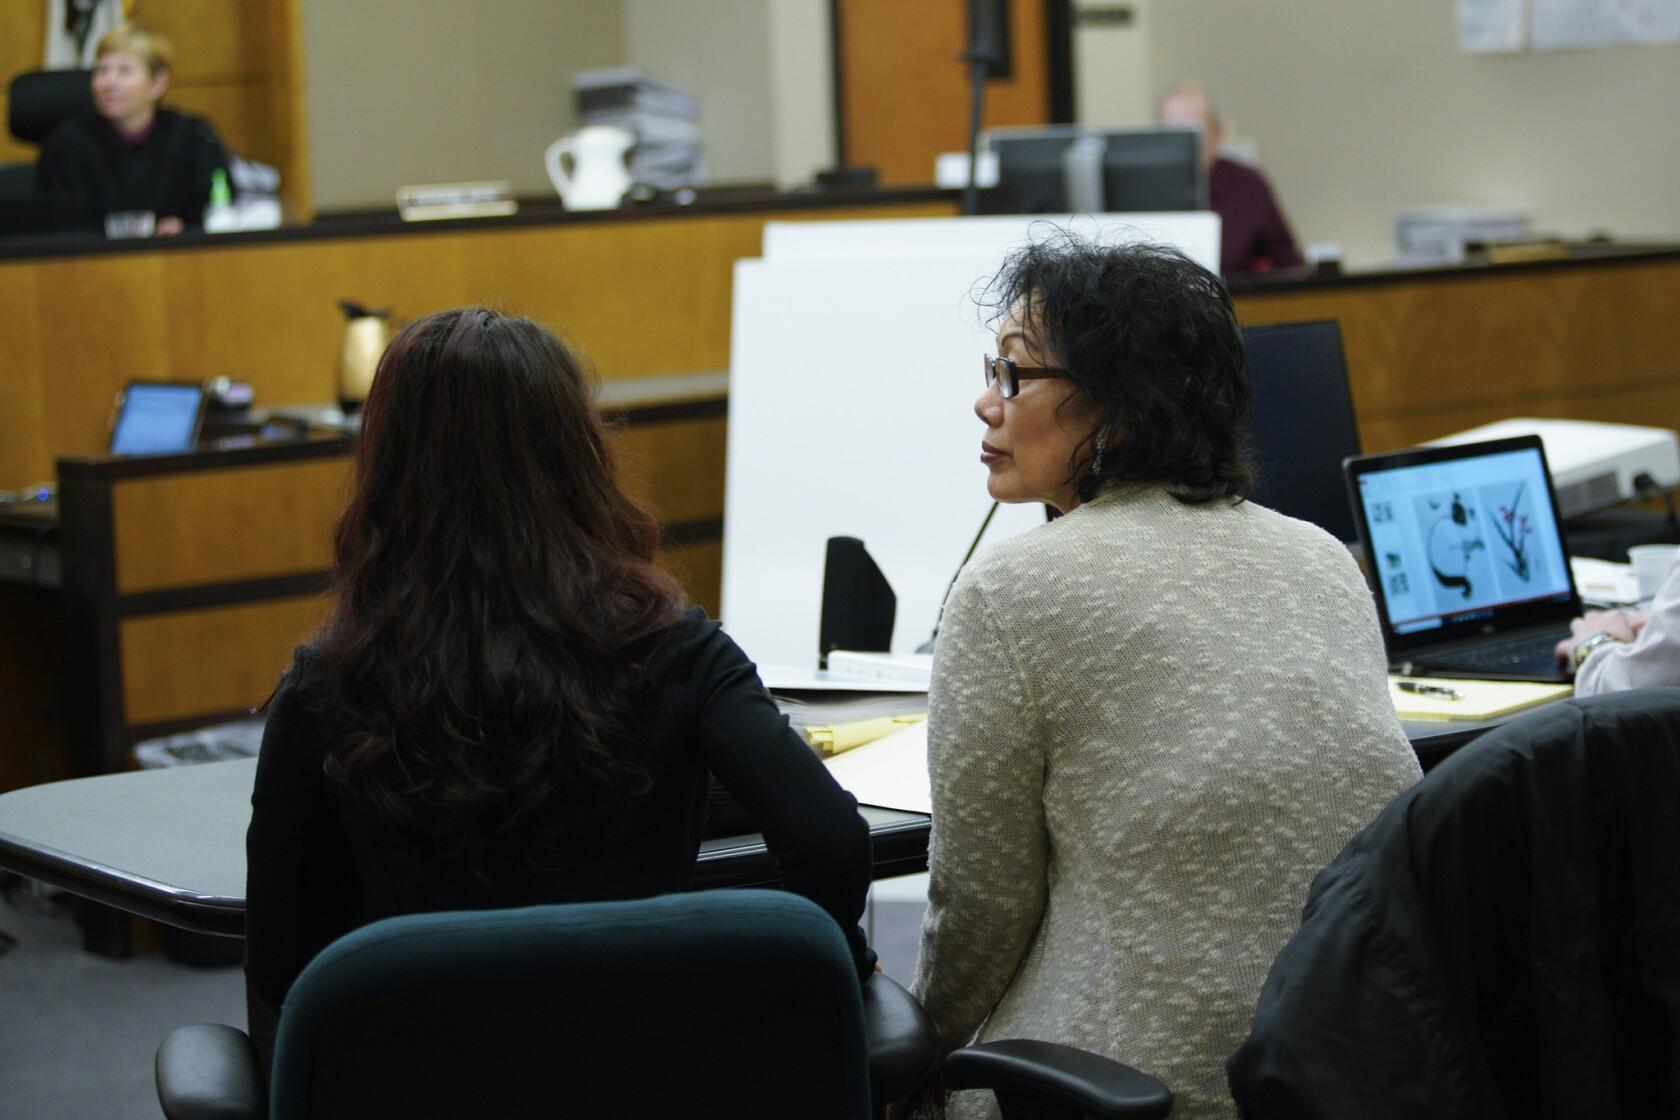 Closing arguments underway in Zahau wrongful death trial - The San